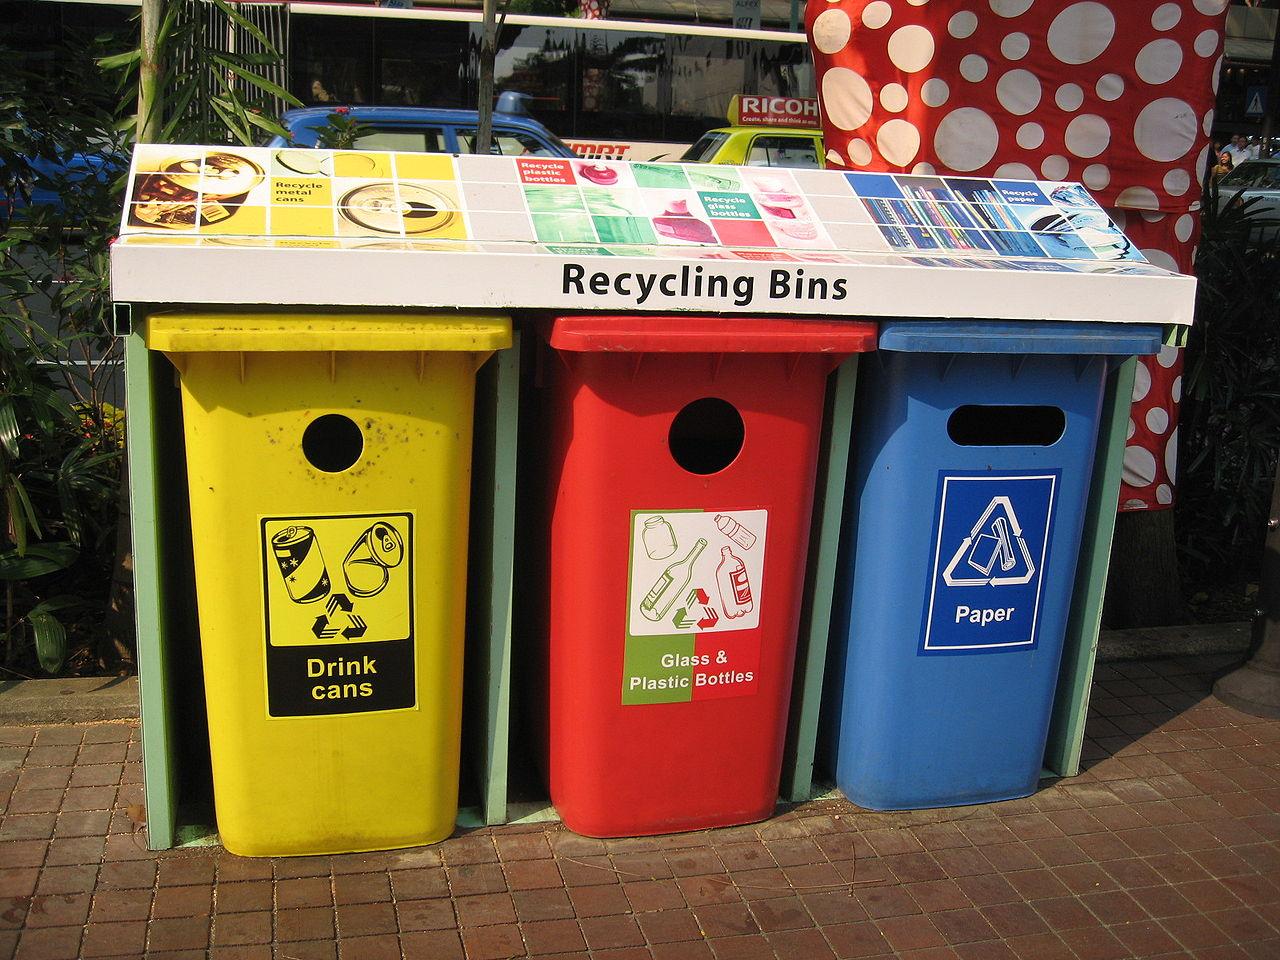 File Nea Recycling Bins Orchard Road